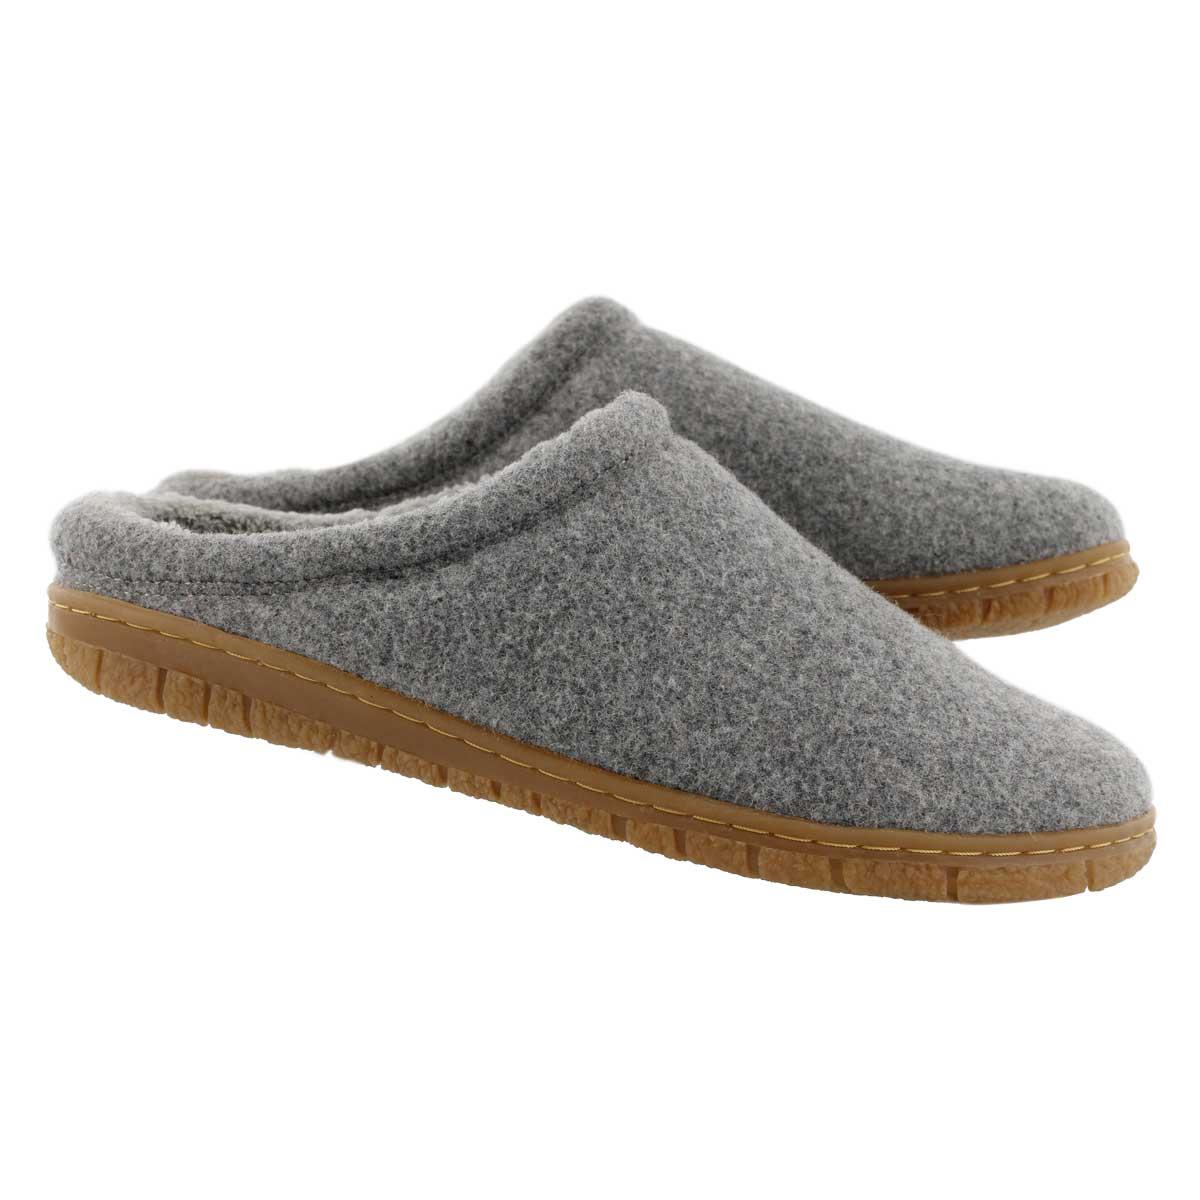 Lds Saturn 2 grey memory foam slipper